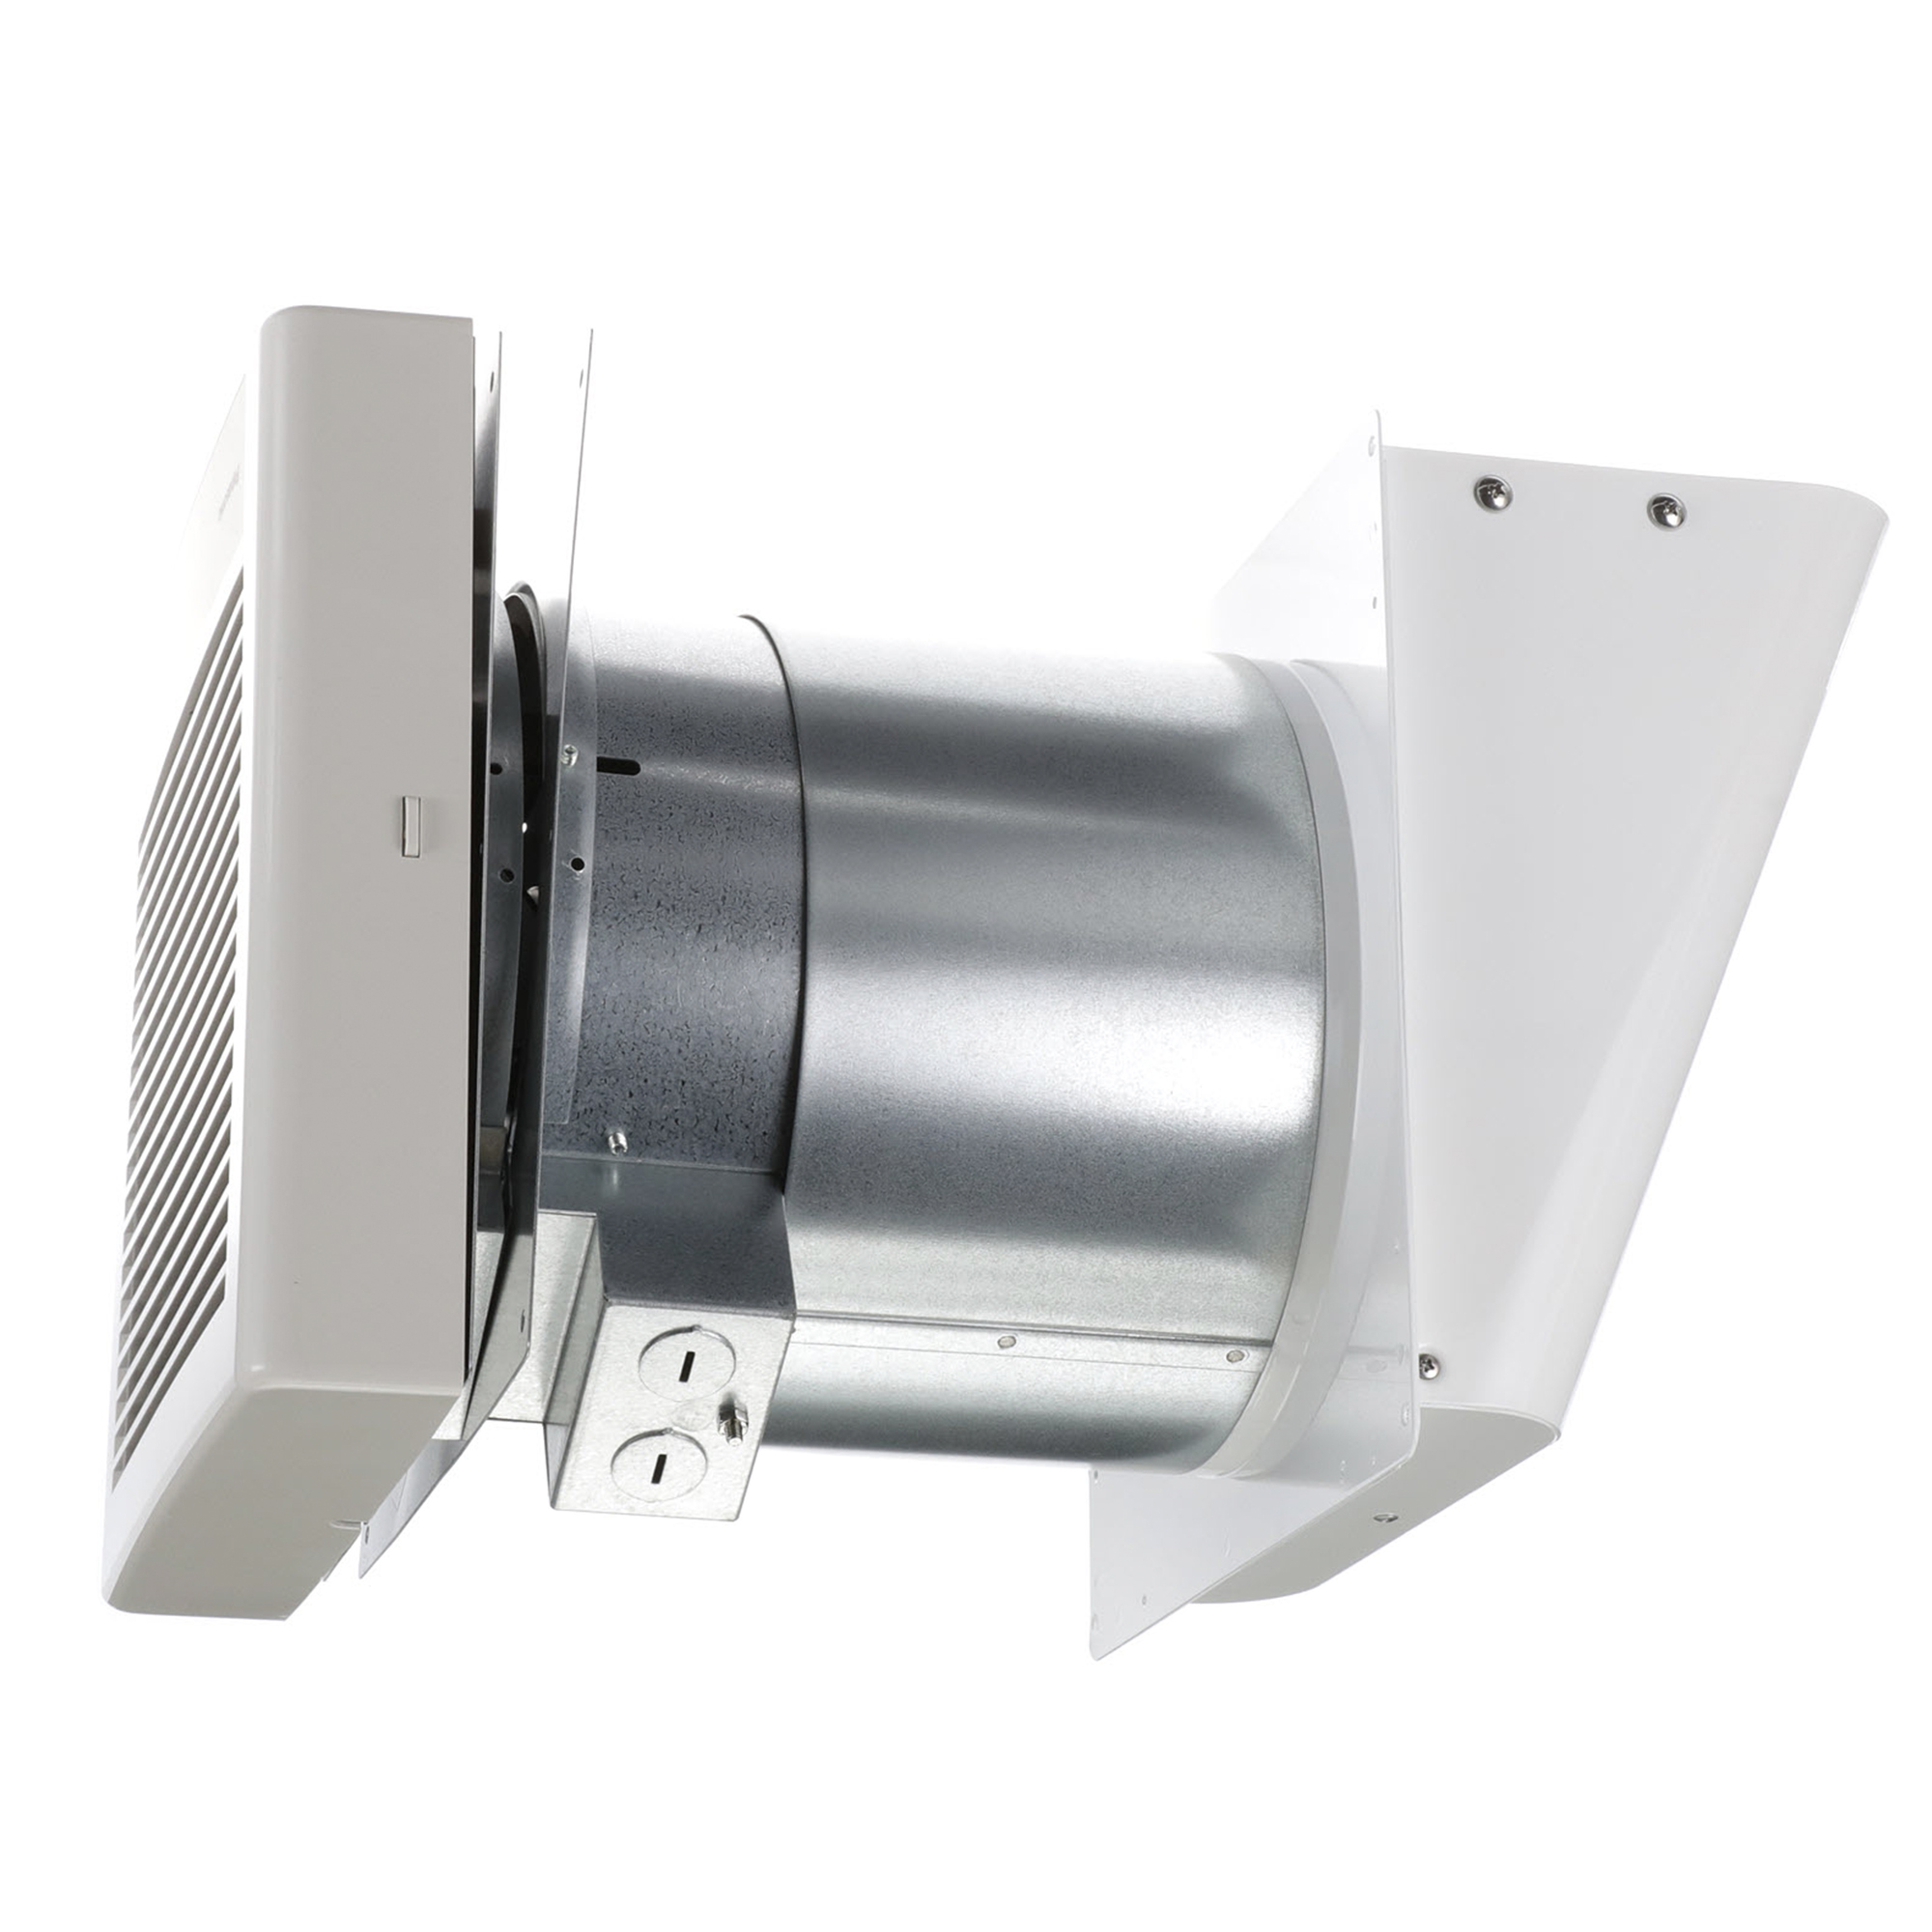 panasonic fv 08wq1 whisperwall ventilation fan quiet air flow long lasting easy to install walmart com